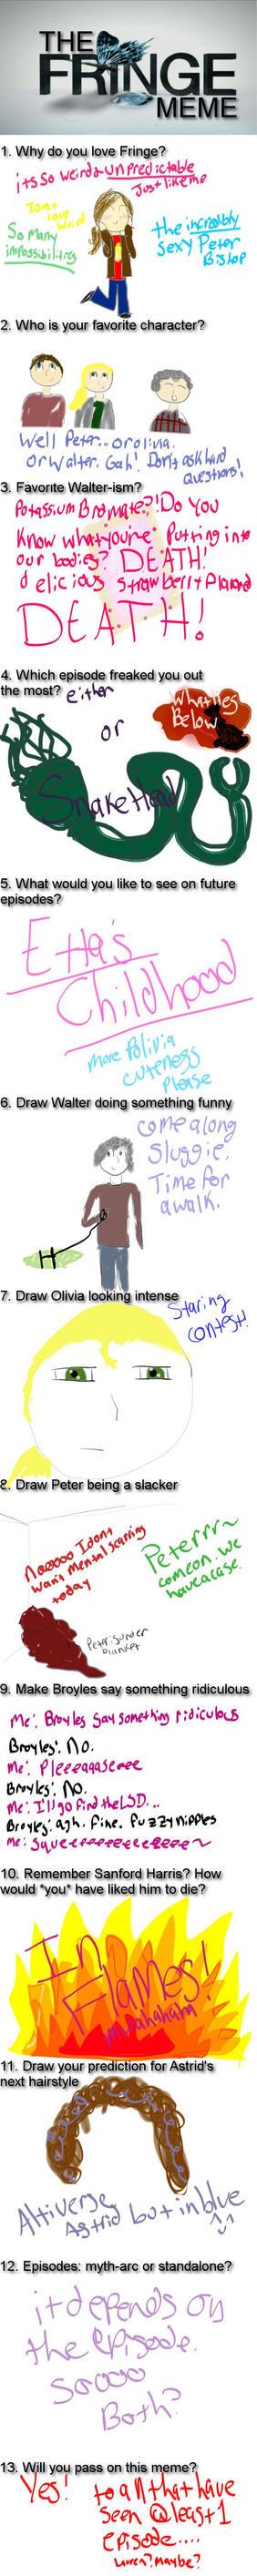 The Fringe Meme by Mikkiizawierdo